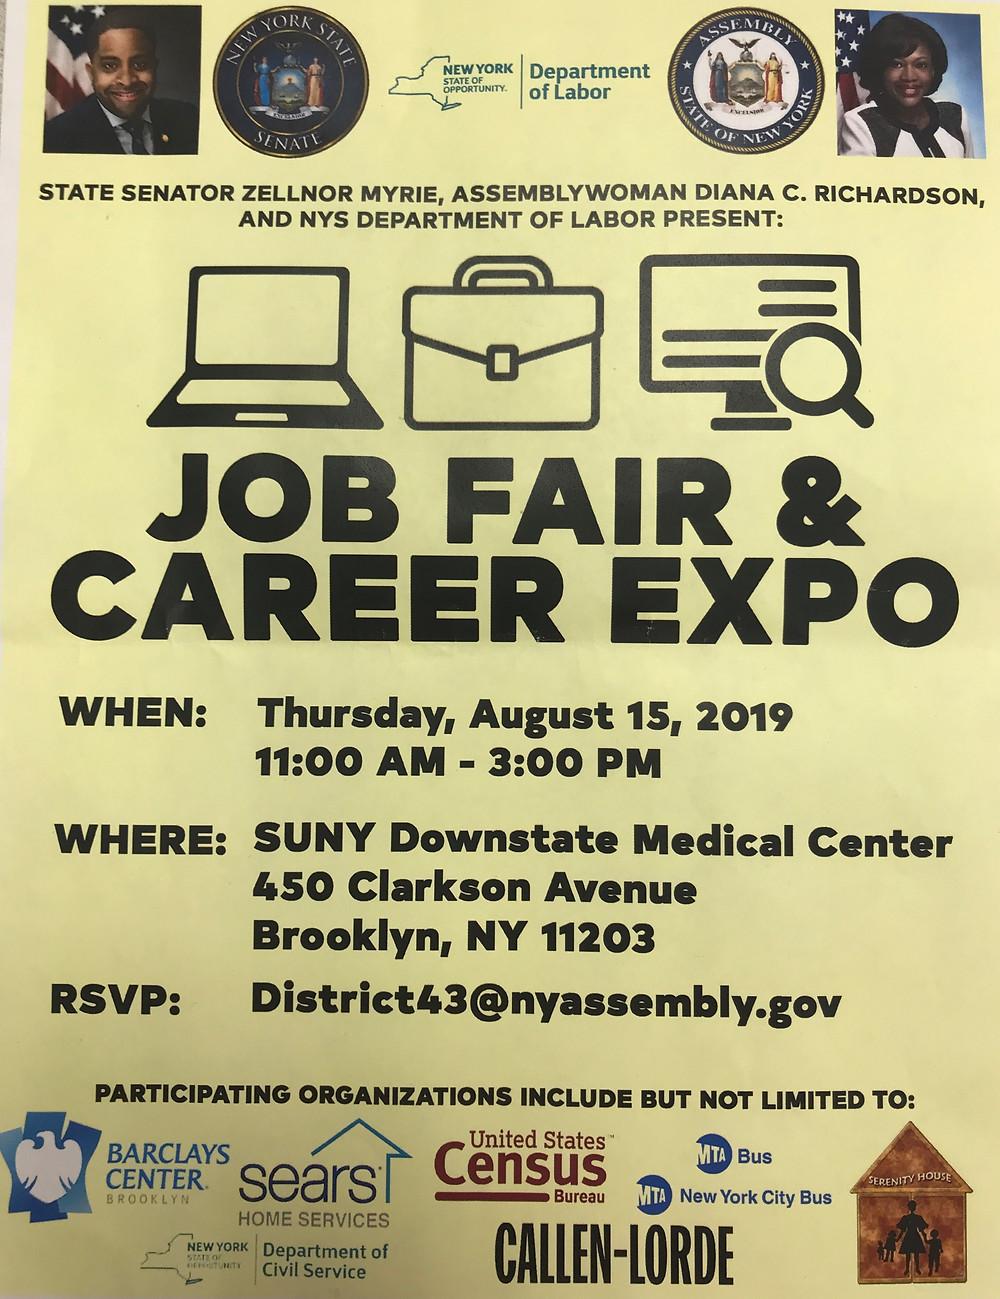 Job Fair Senator Zellnor Myrie Assemblywoman Diana Richardson NYS Department of Labor Job Fair and Career Expo NHS Brooklyn NYC 2019